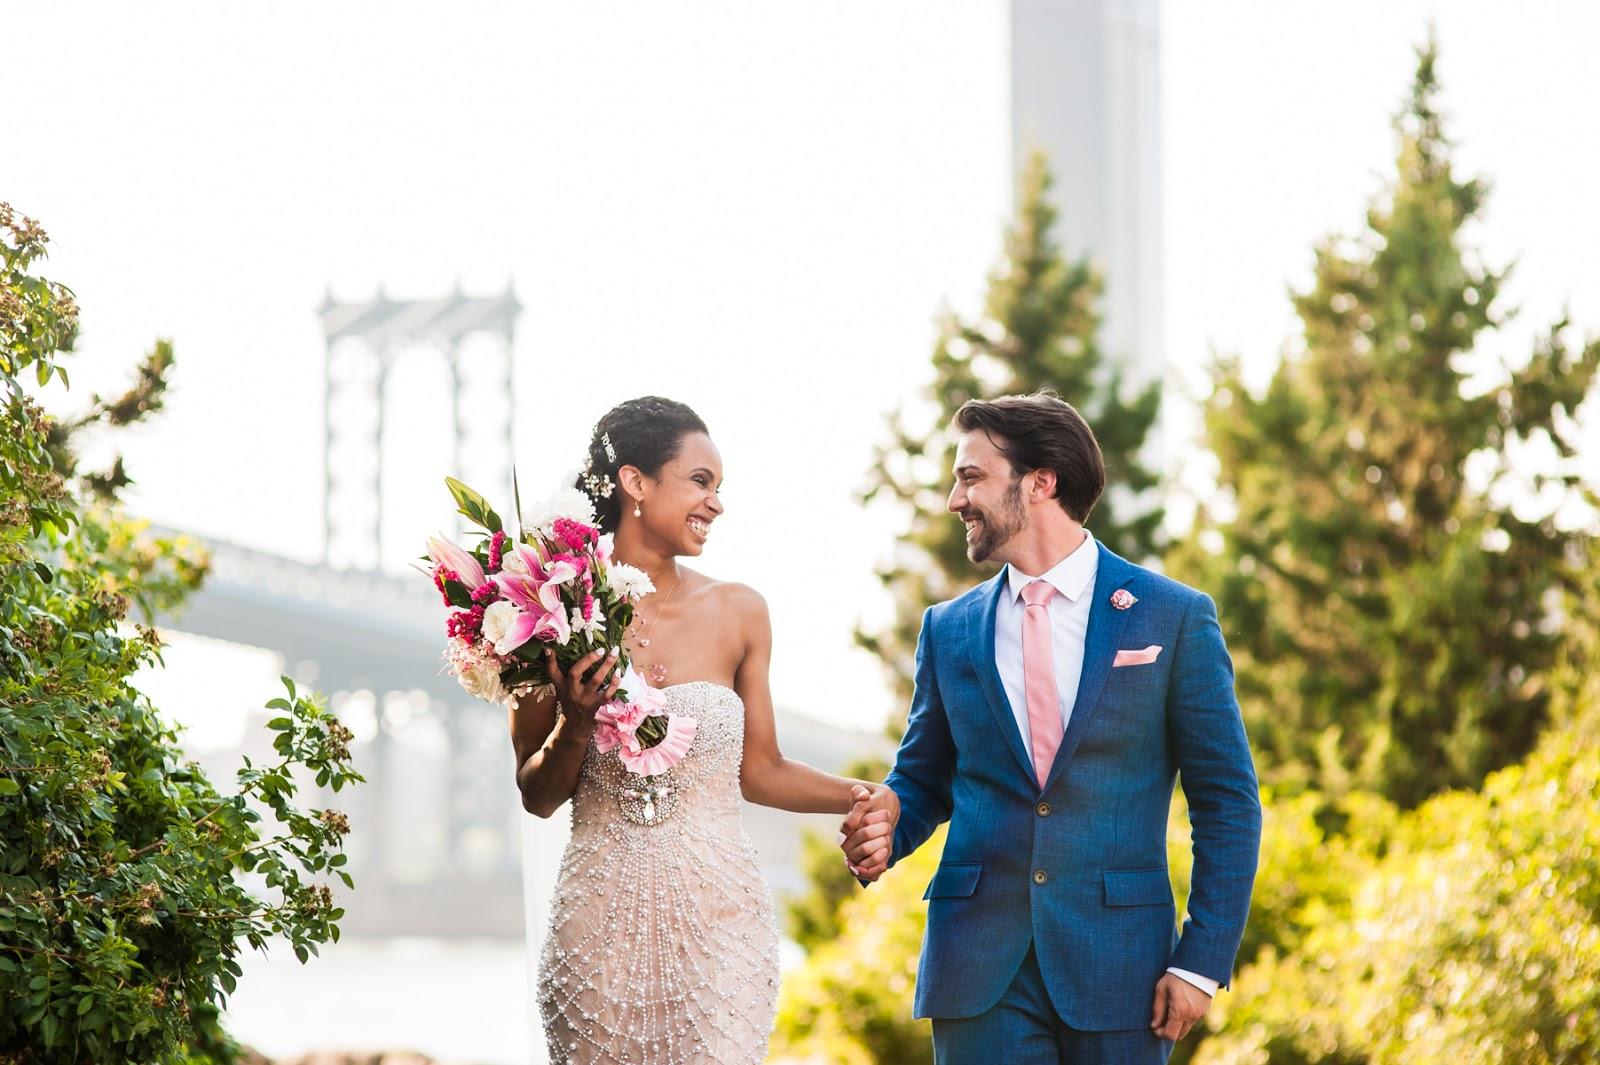 Central Park New York Wedding Photography